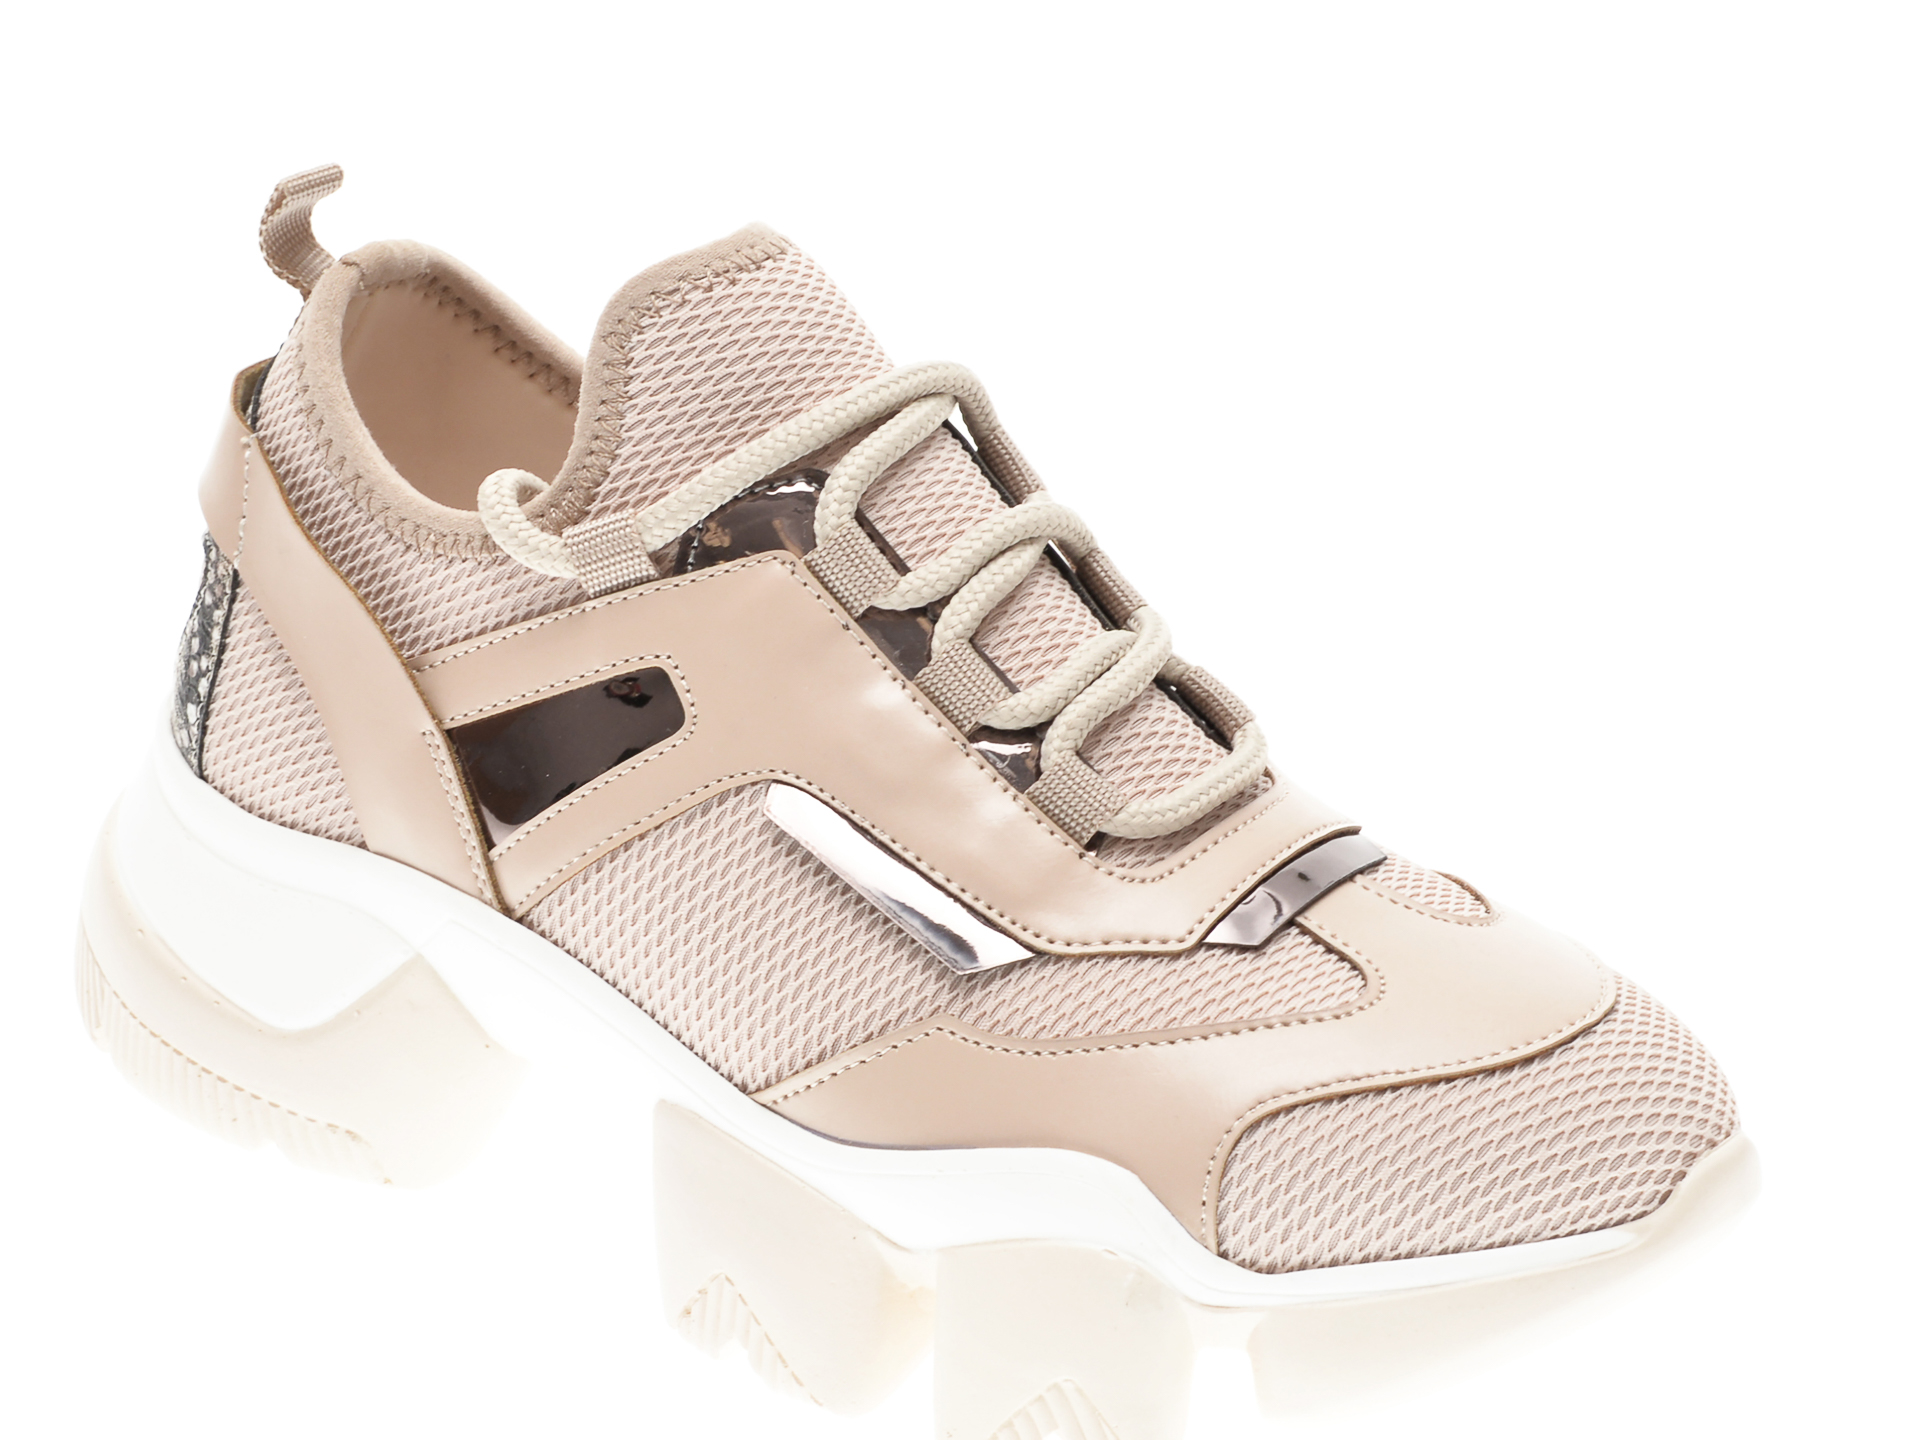 Pantofi sport GRYXX bej, MO9953, din piele ecologica imagine